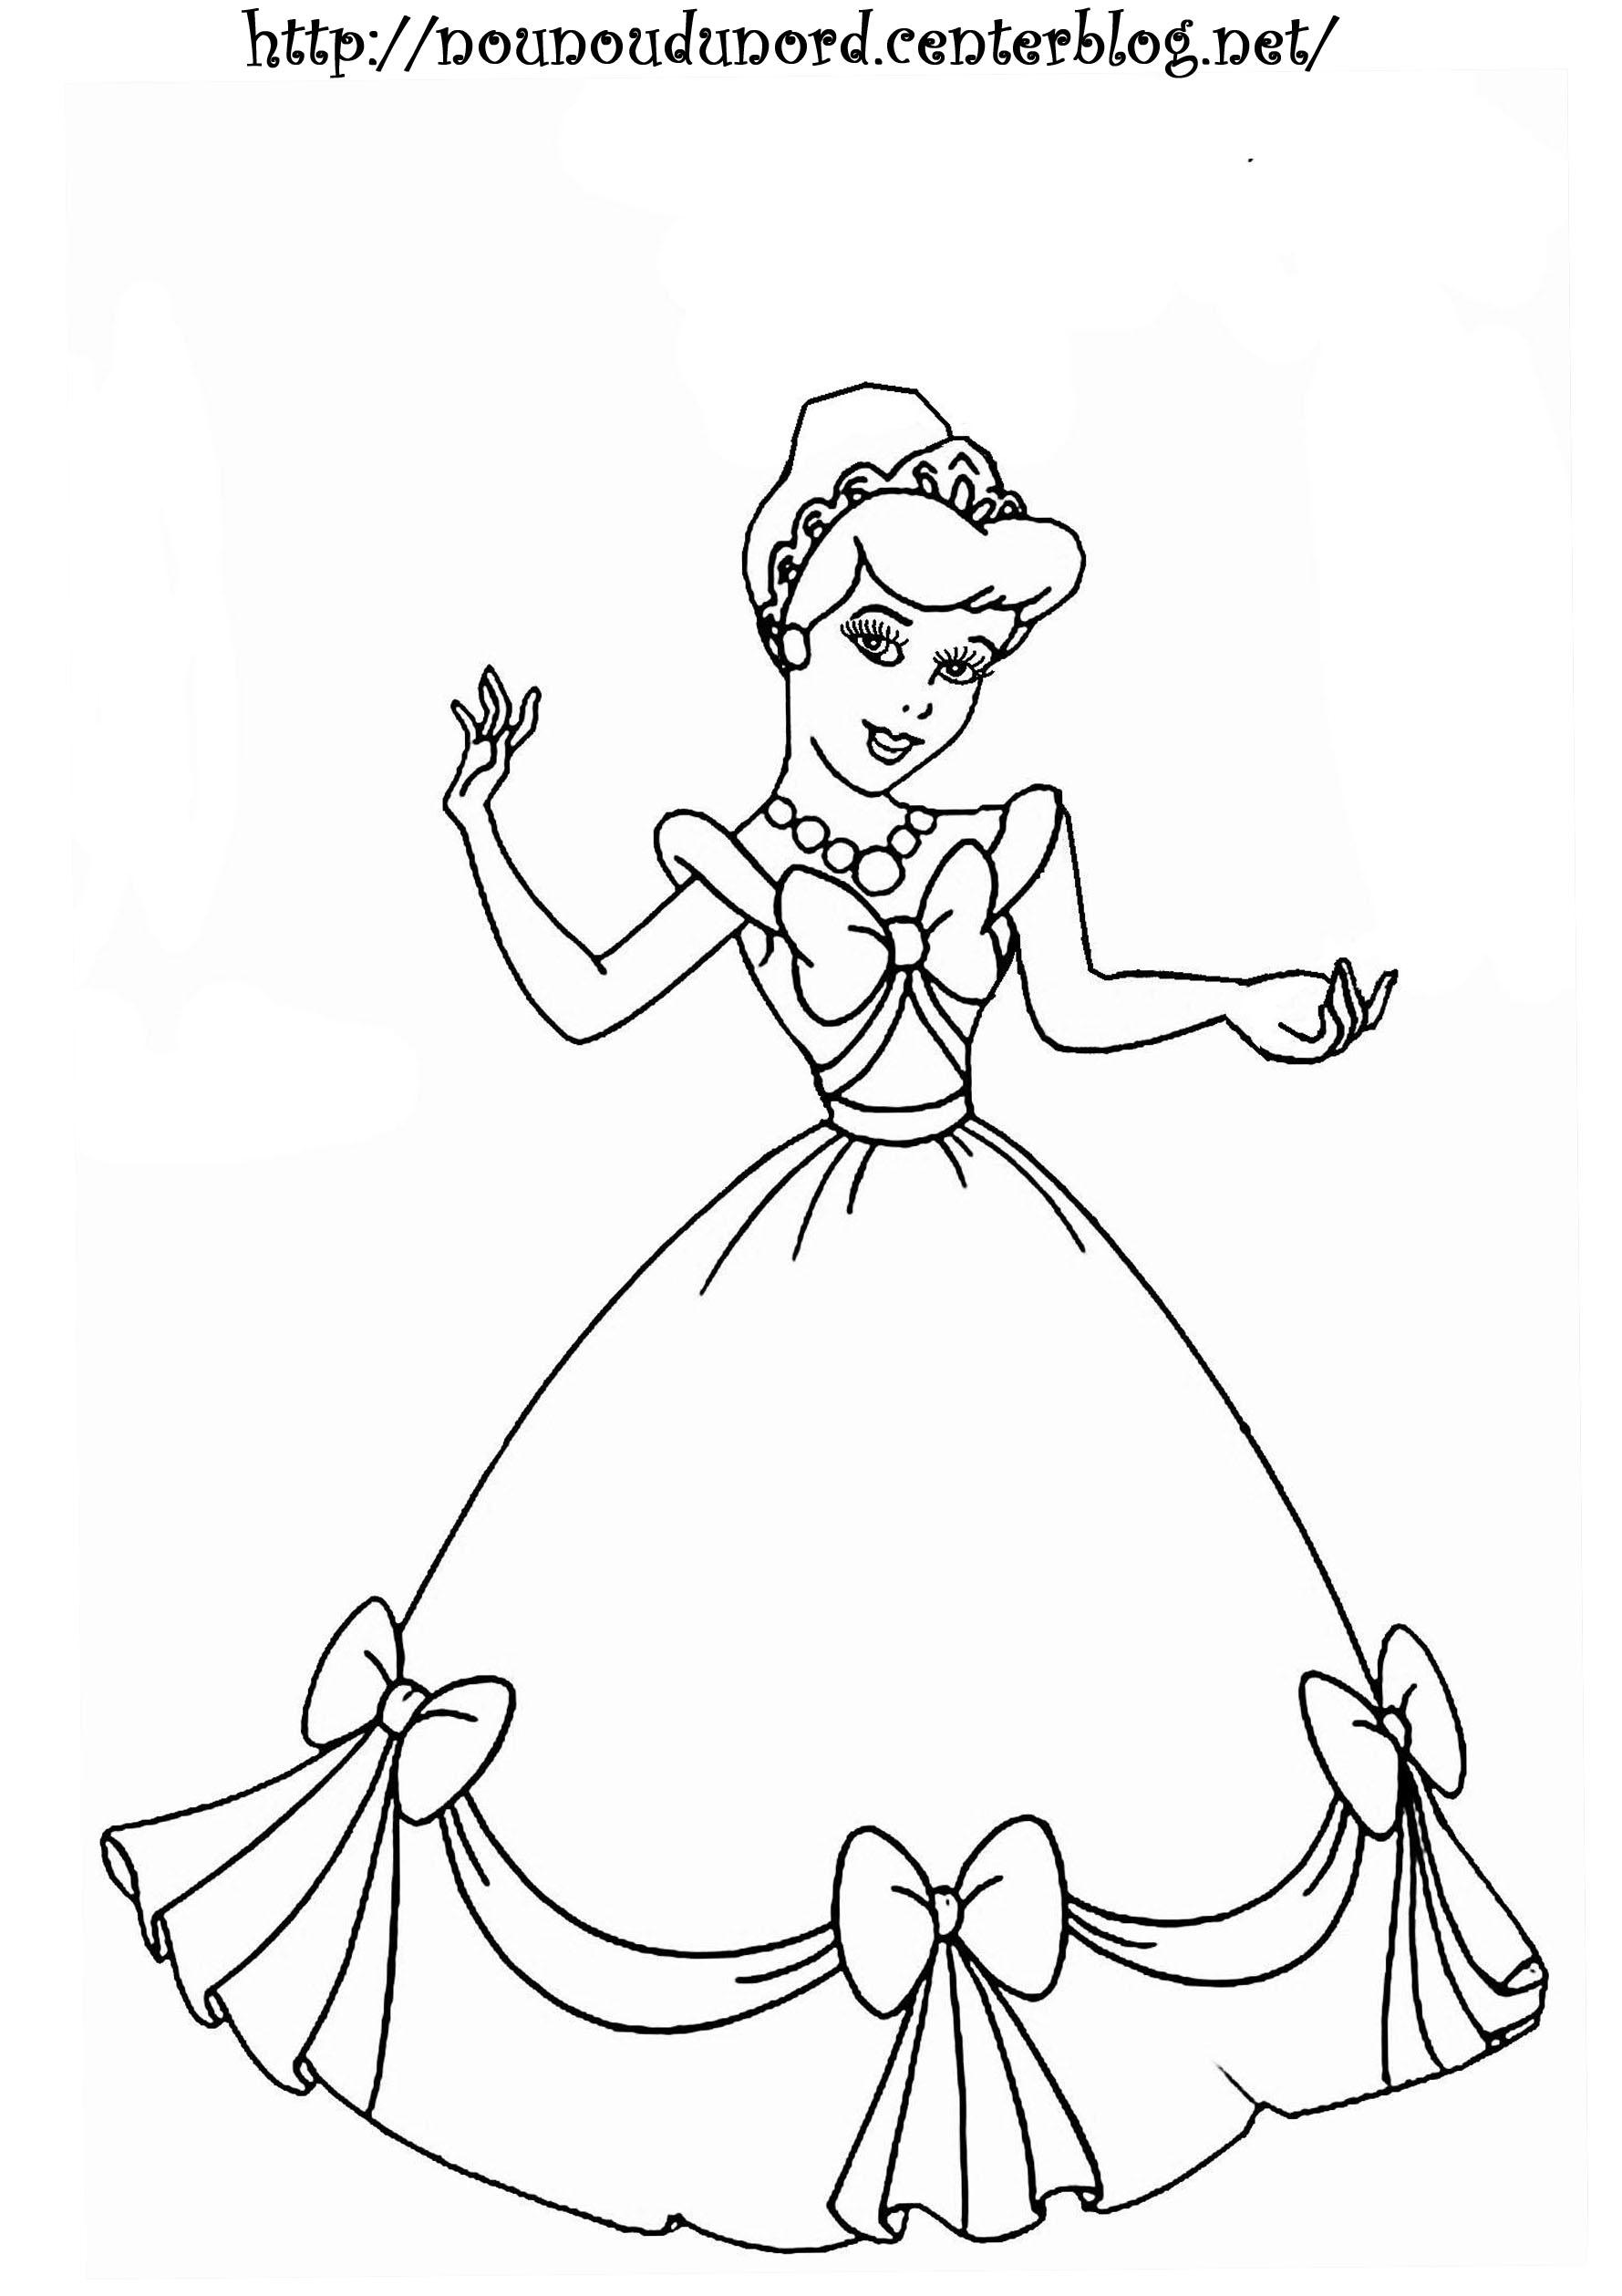 20 dessins de coloriage princesse imprimer gratuit imprimer. Black Bedroom Furniture Sets. Home Design Ideas